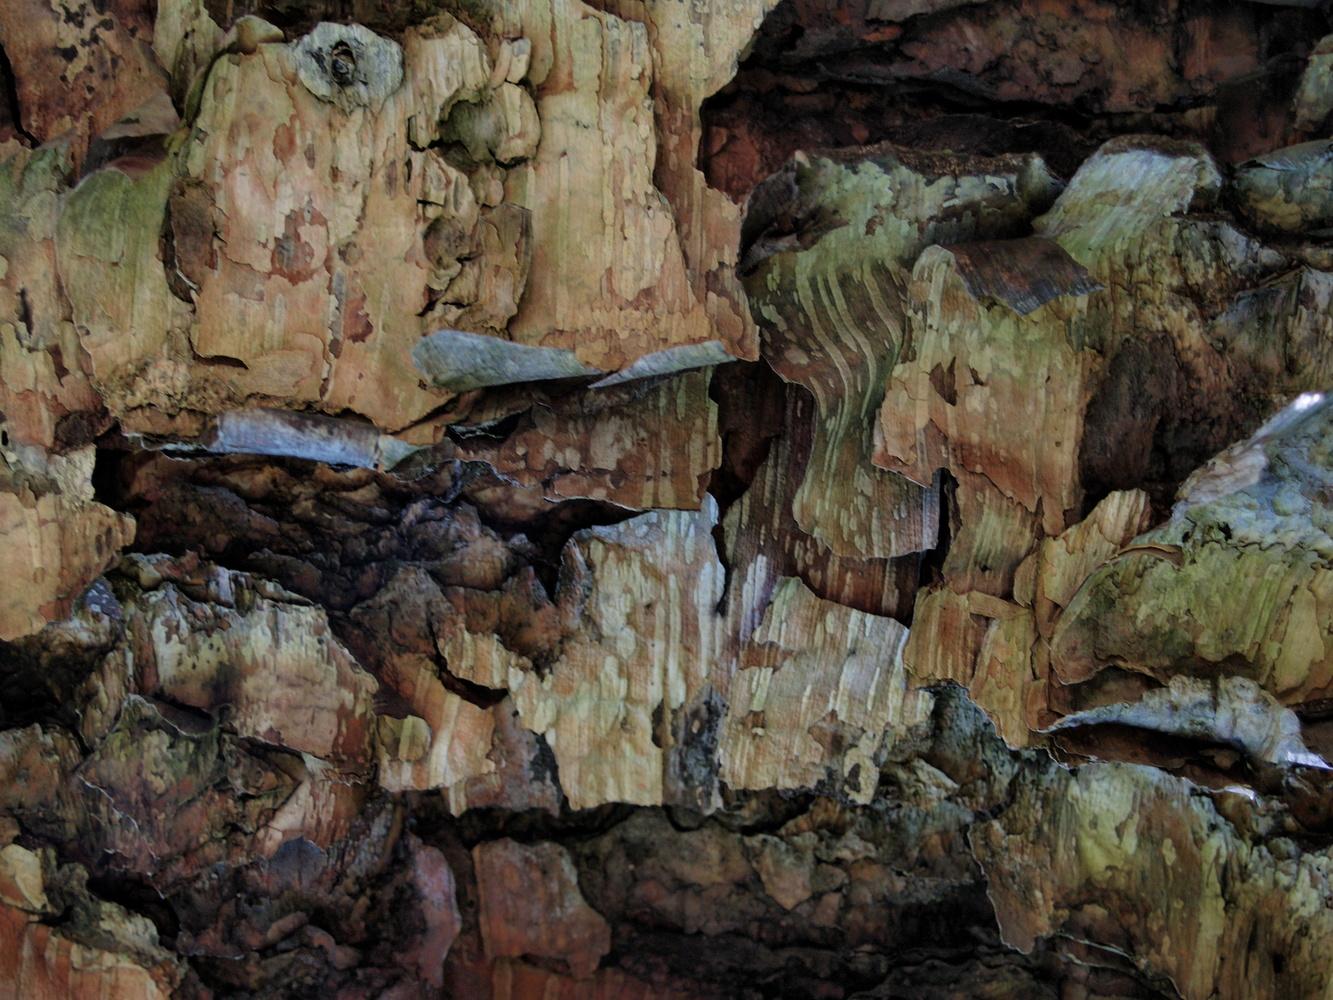 Bark Ser. 1 by James R Johnson